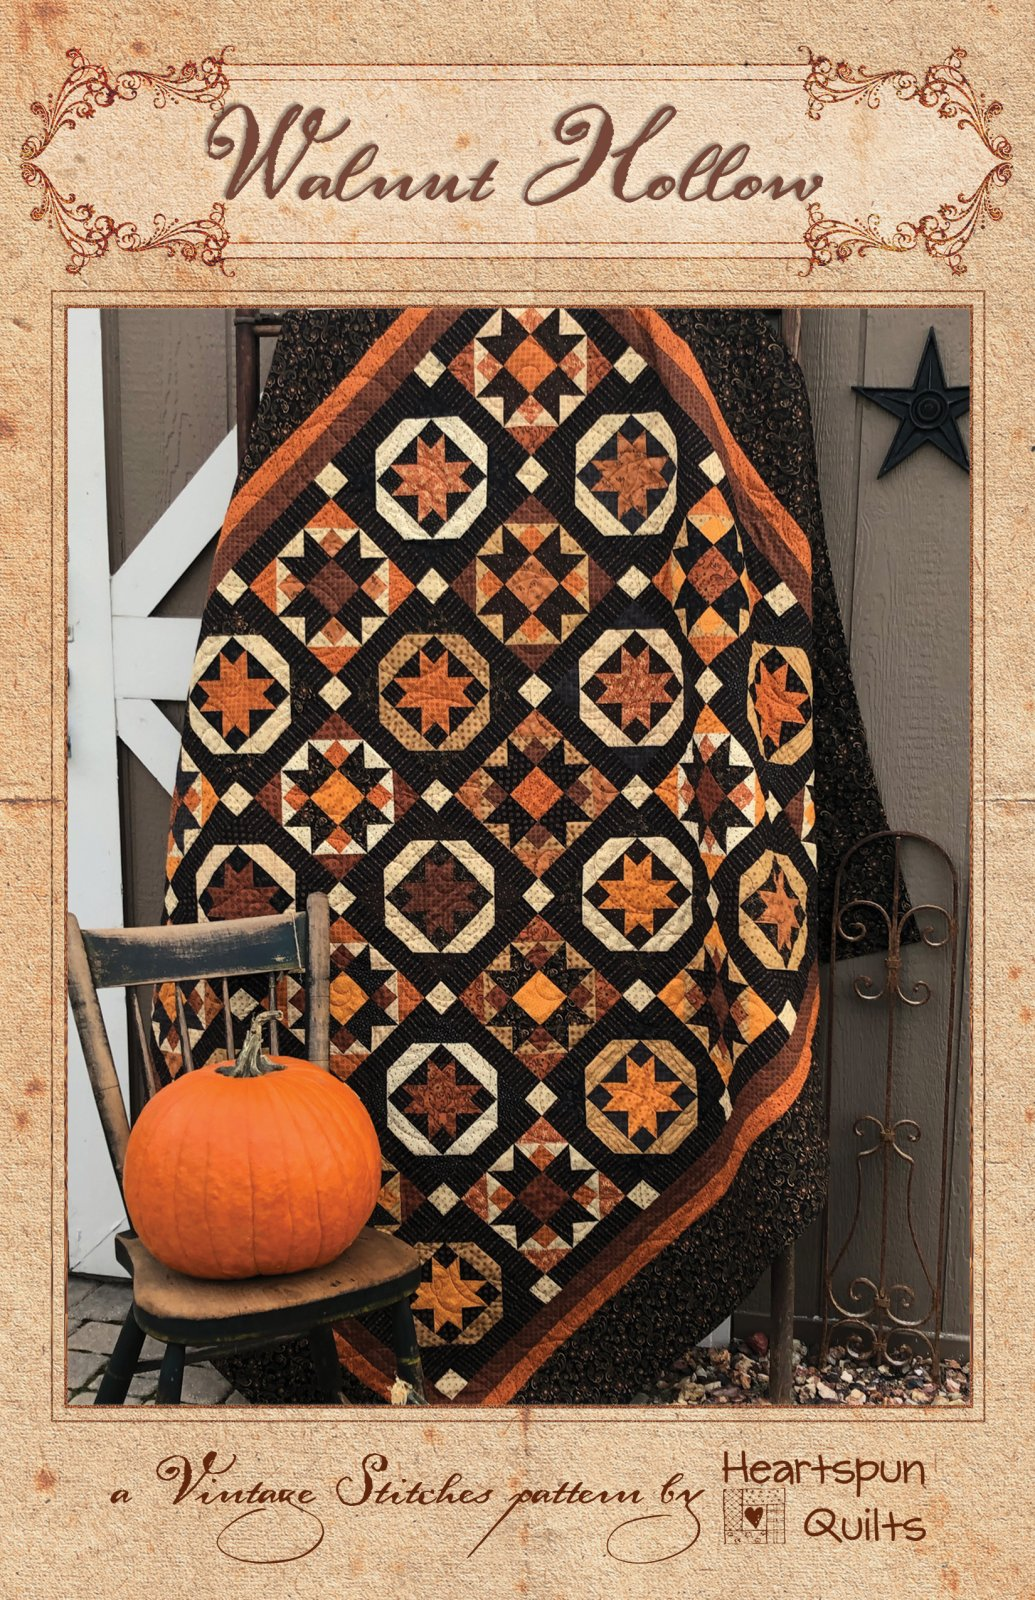 Walnut Hollow pattern